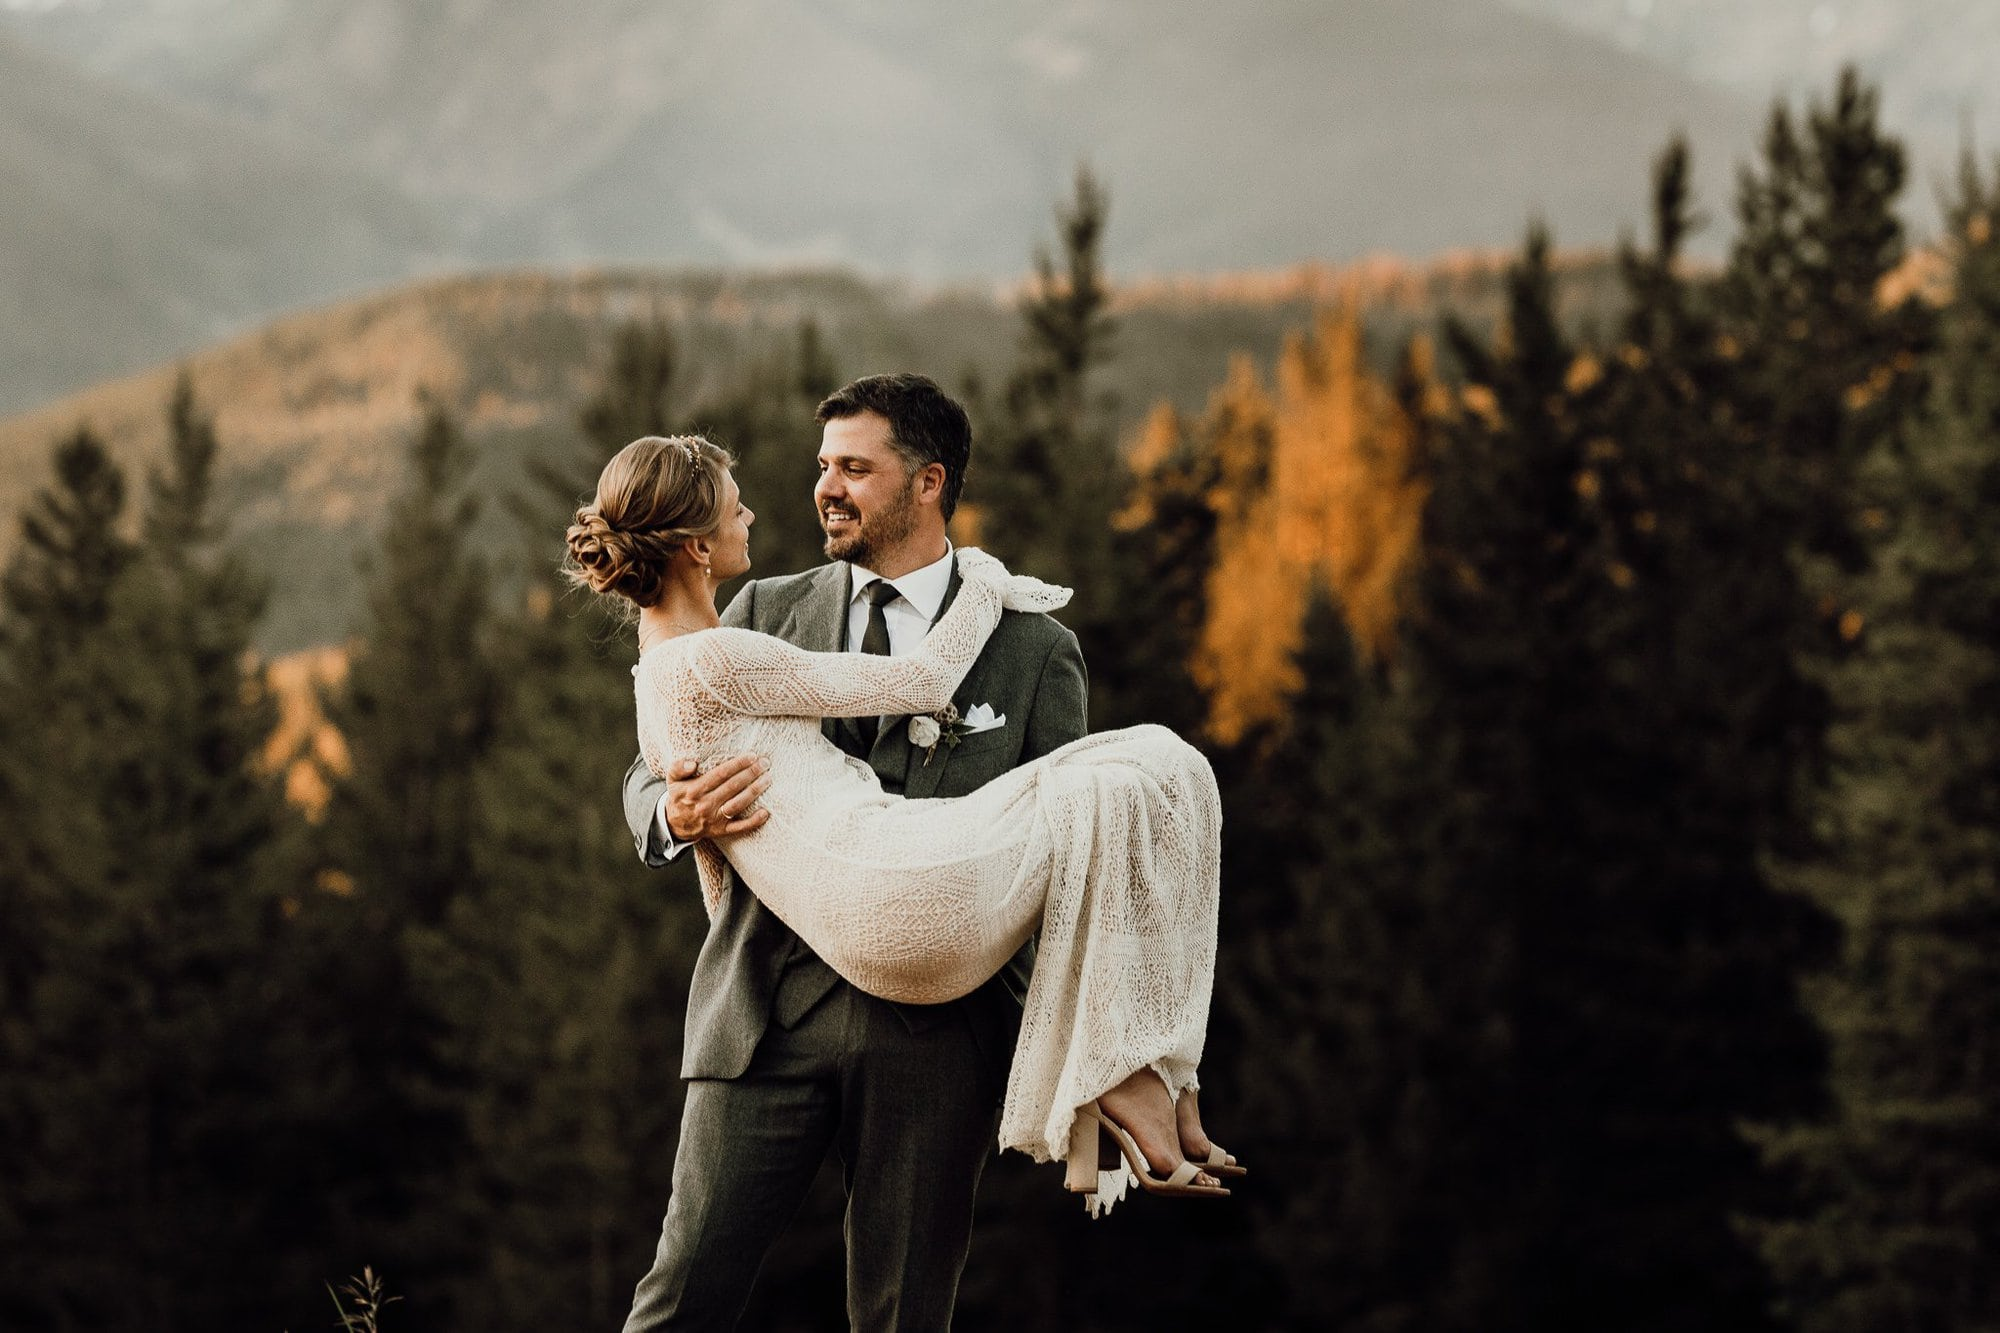 Vail Wedding PHOTOGRAPHY| JUSTYNA E BUTLER PHOTOGRAPHY | ROCKY MOUNTAIN NATIONAL PARK WEDDING |COLORADO MOUNTAIN WEDDING PHOTOGRAPHER